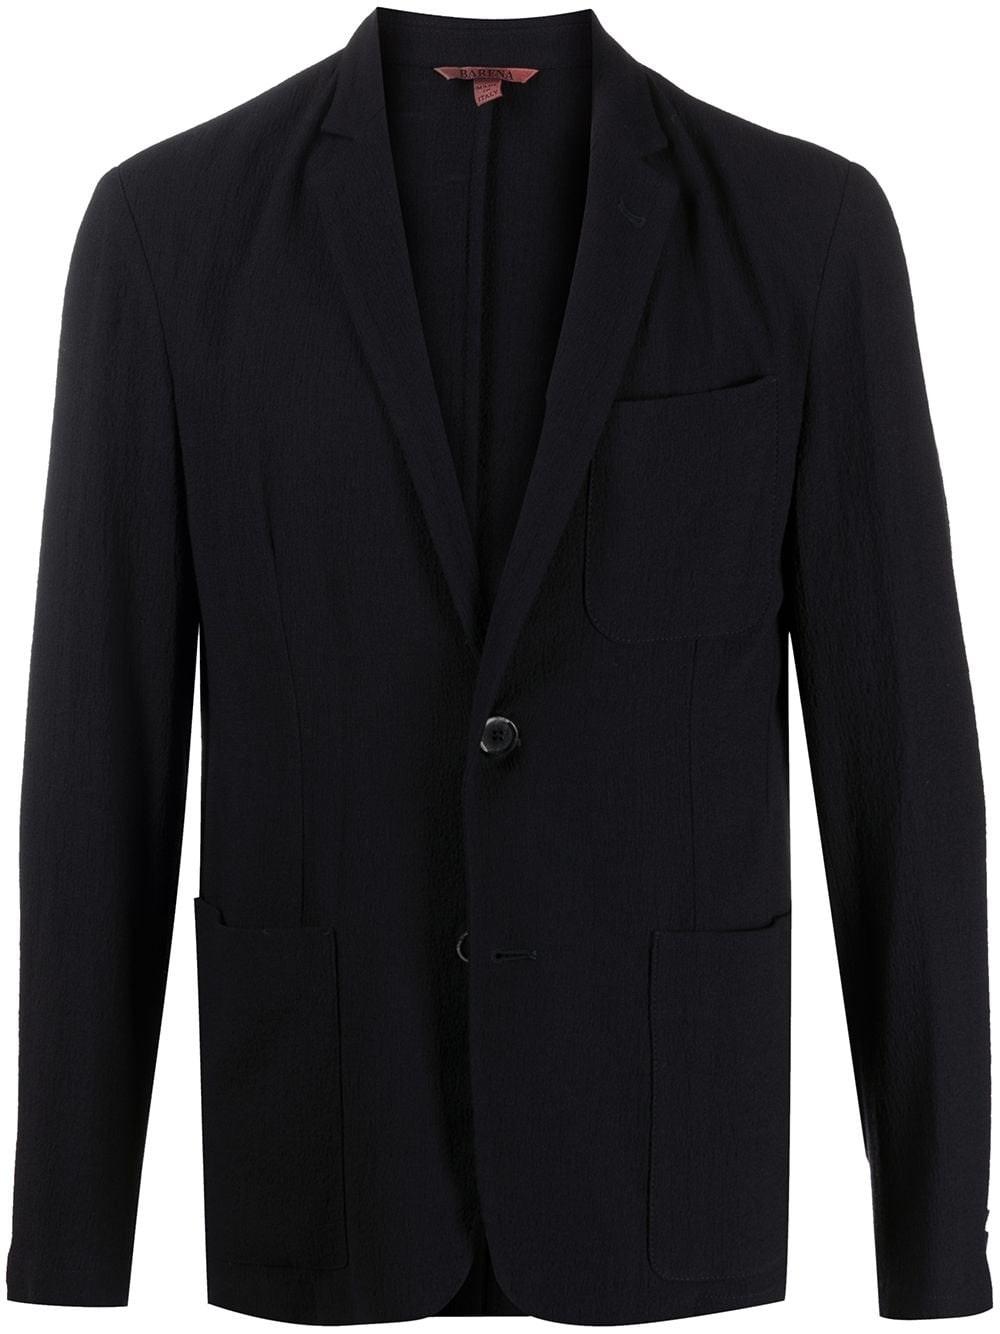 BARENA VENEZIA Blue Crepe Jacket